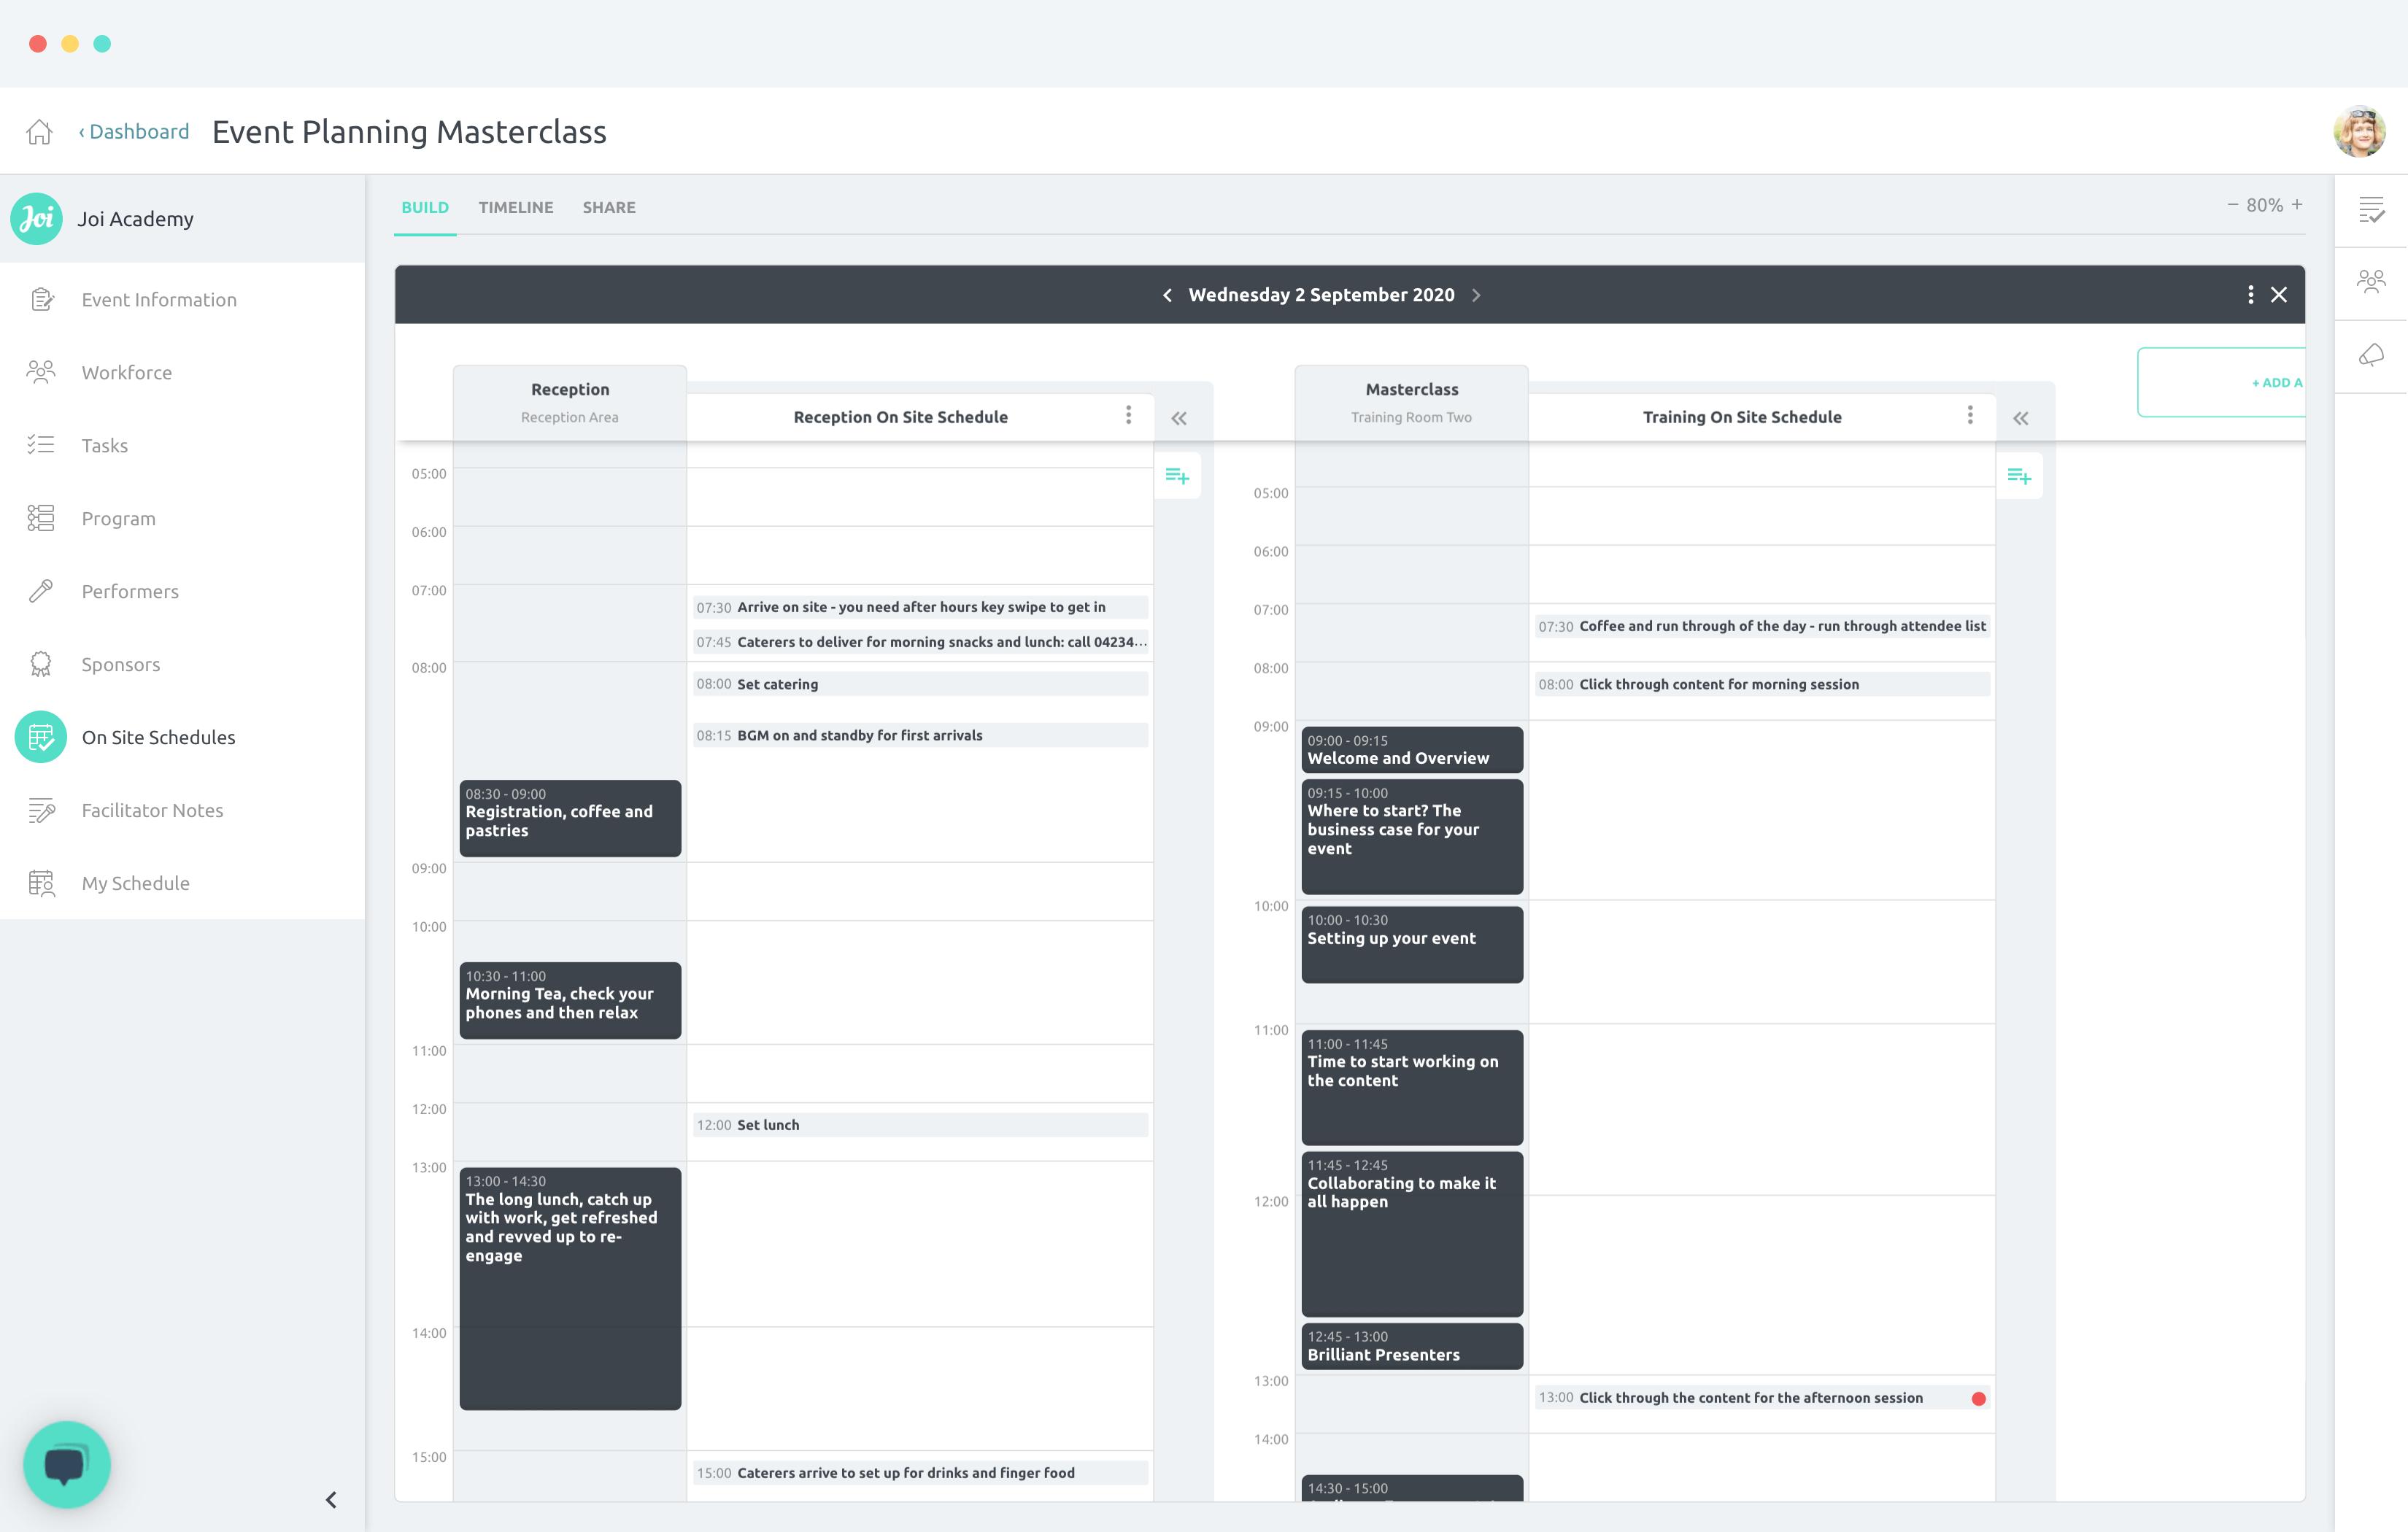 On Site Schedules screenshot